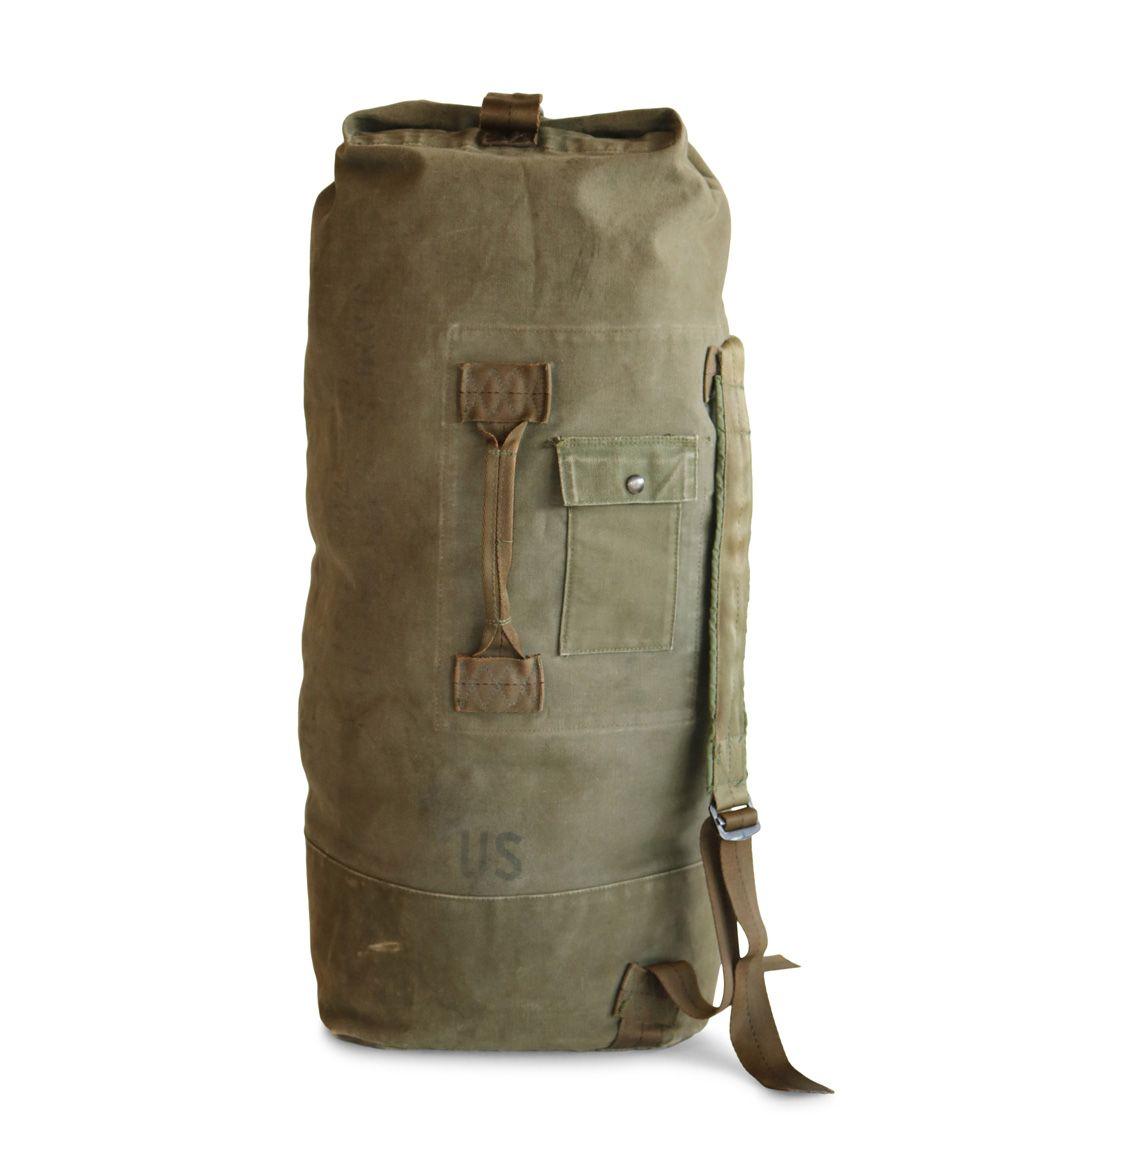 U.S. ARMY Duffel Bag Vietnam War Era  d220815deb4